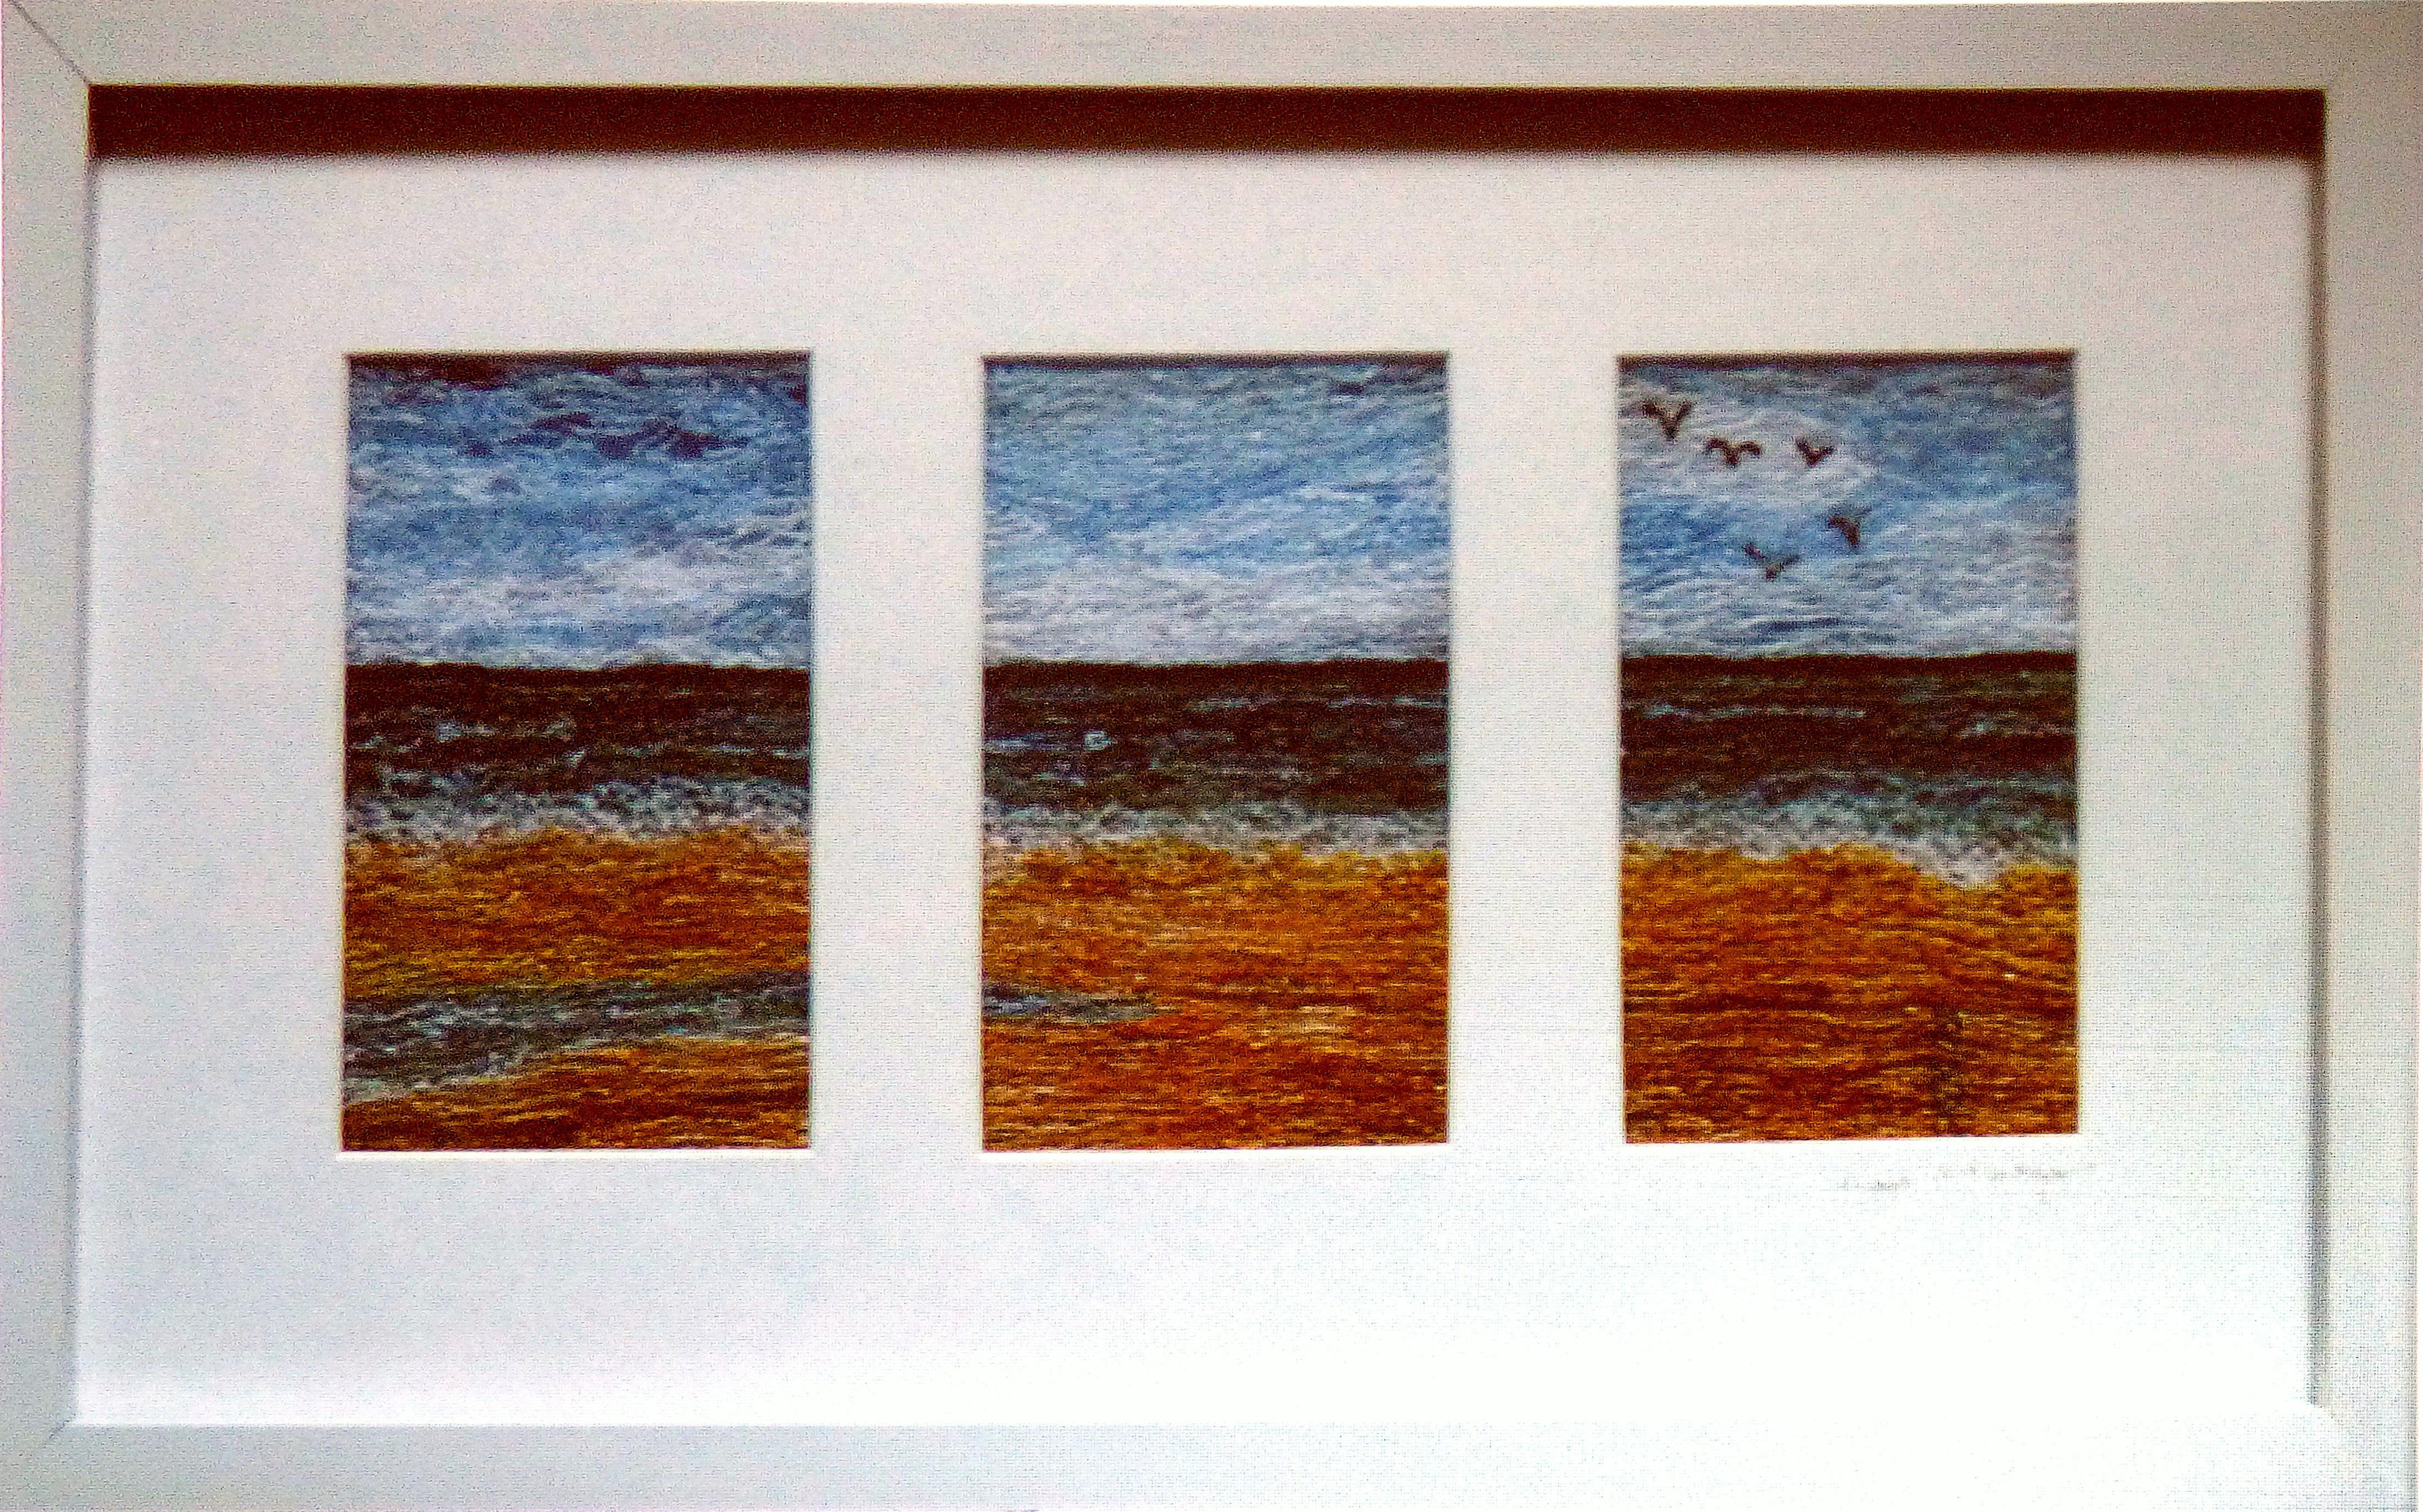 TALACRE BEACH, free machine embroidery by Moya McCarthy, N.Wales EG